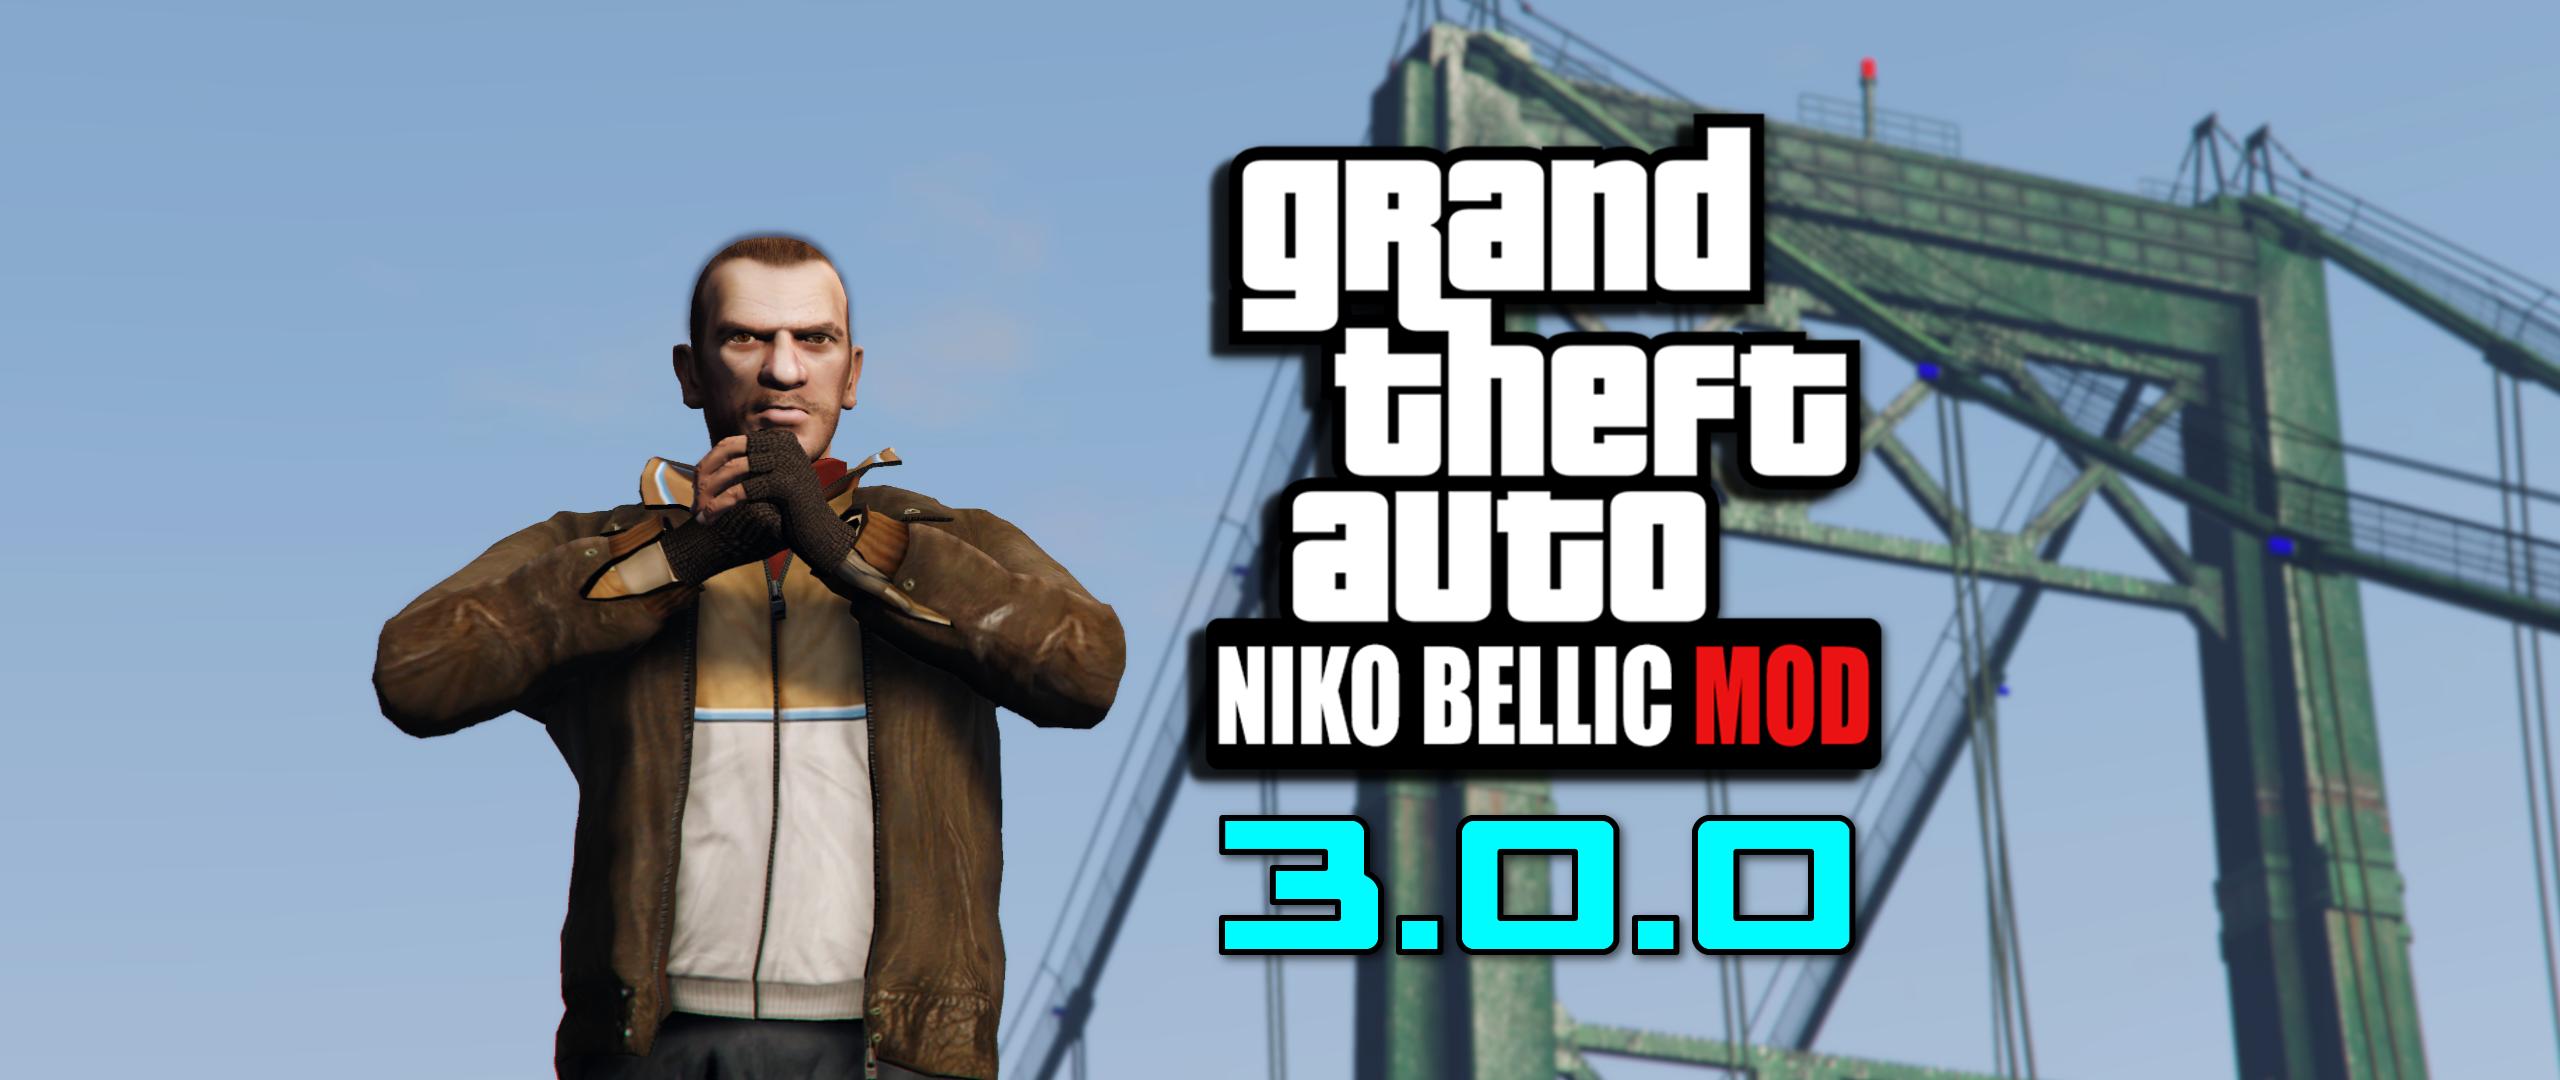 Niko Bellic - GTA5-Mods.com